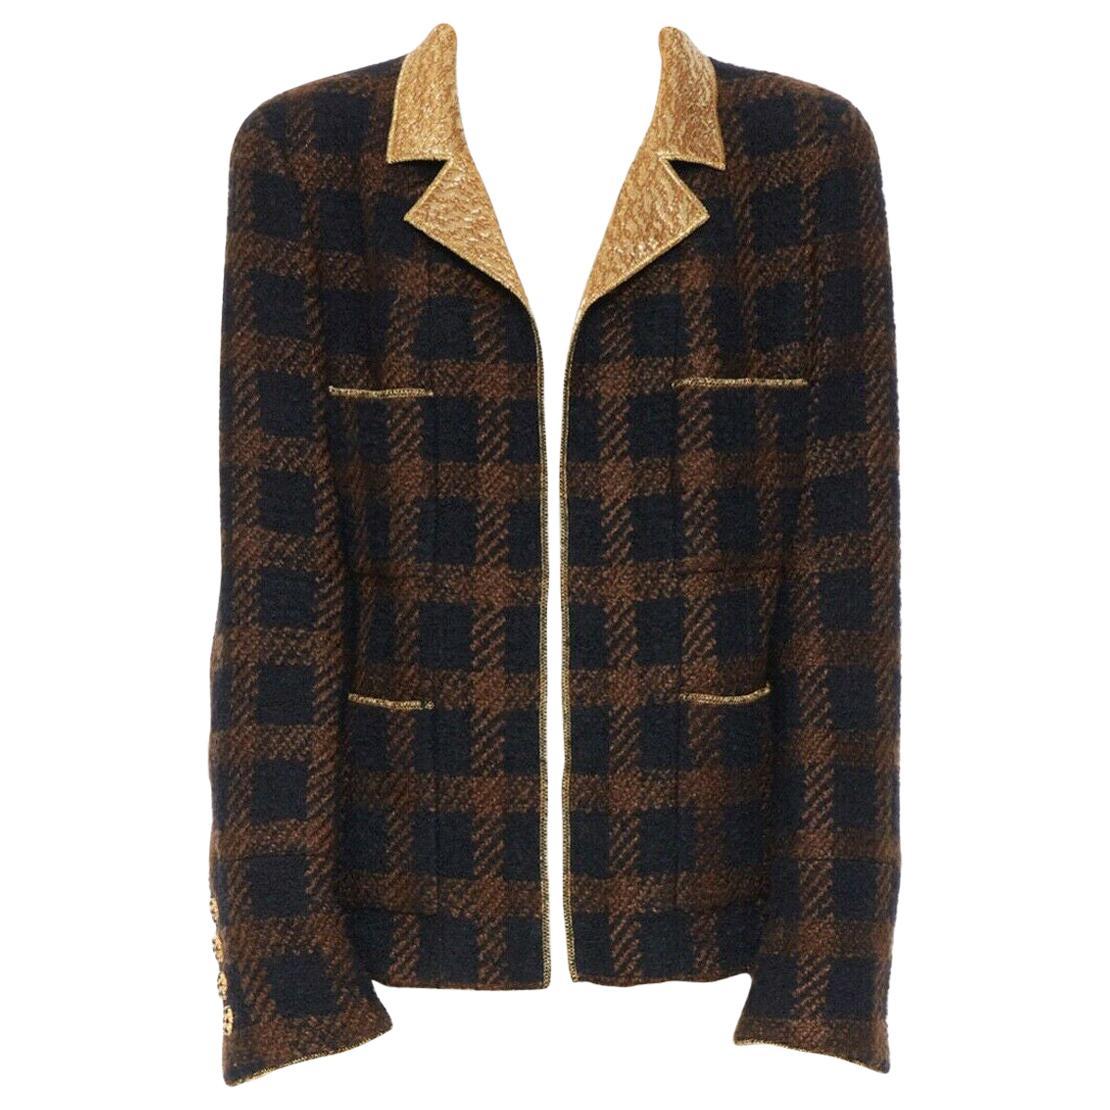 runway CHANEL 96A brown tweed brocade collar gripoix lame gold lapel jacket FR46